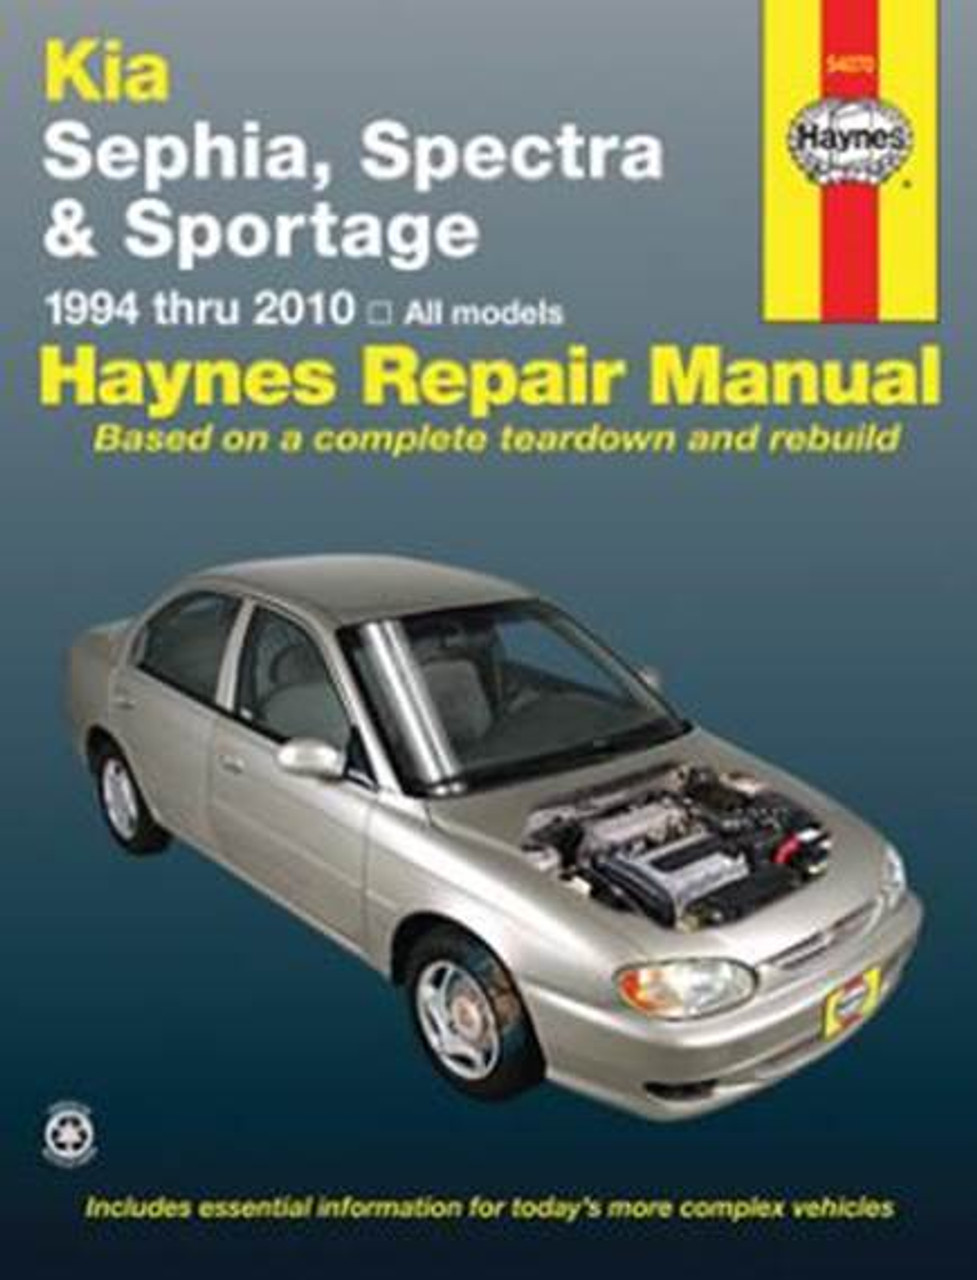 Kia Sephia and Spectra (Mentor / Sportage) 1994 - 2010 Workshop Manual